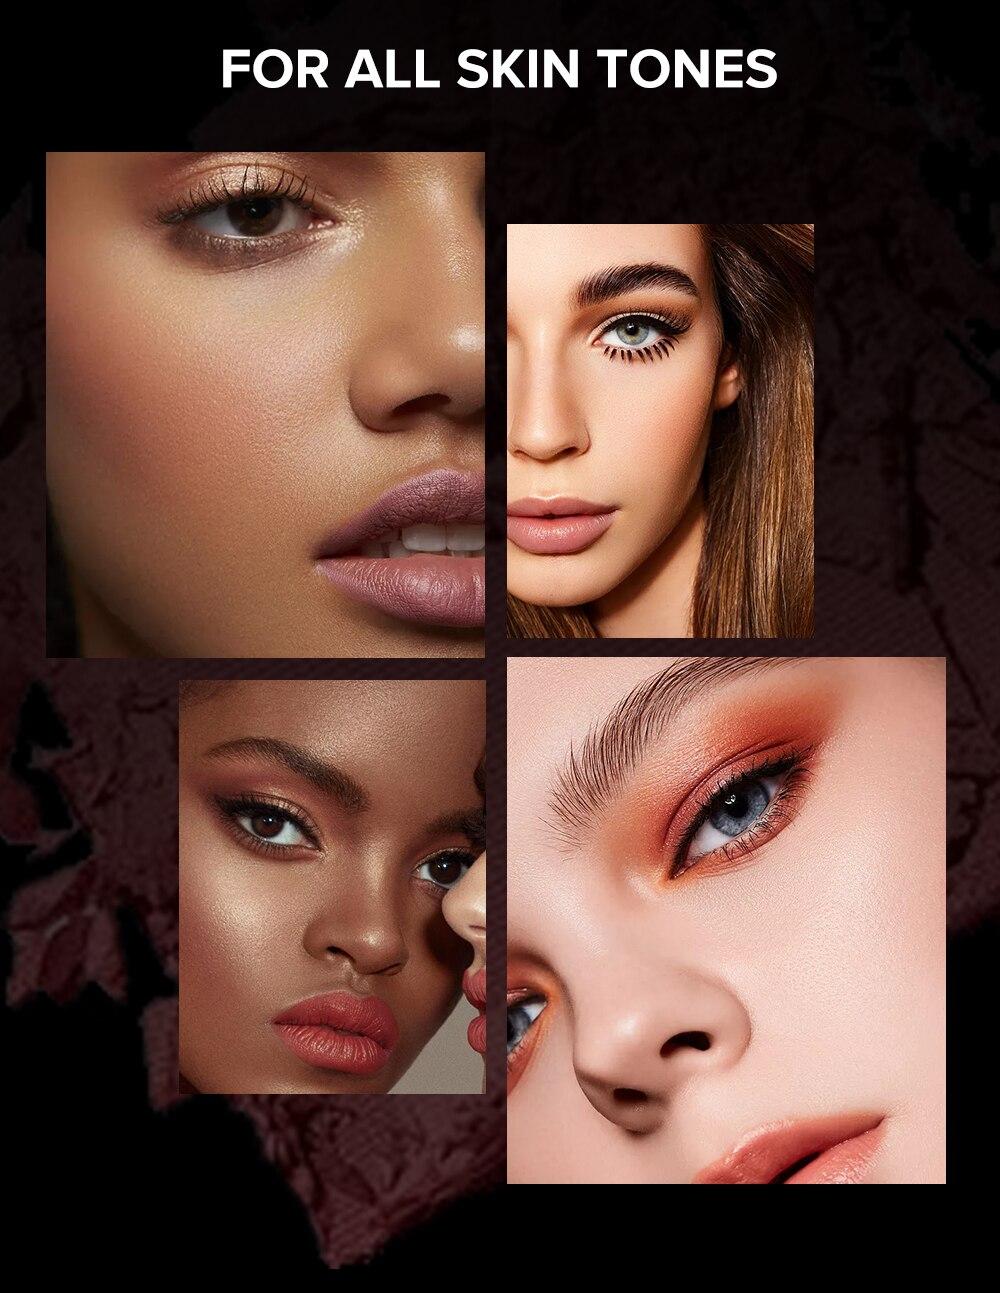 shimmer maquiagem nude olhos tons pallete natural